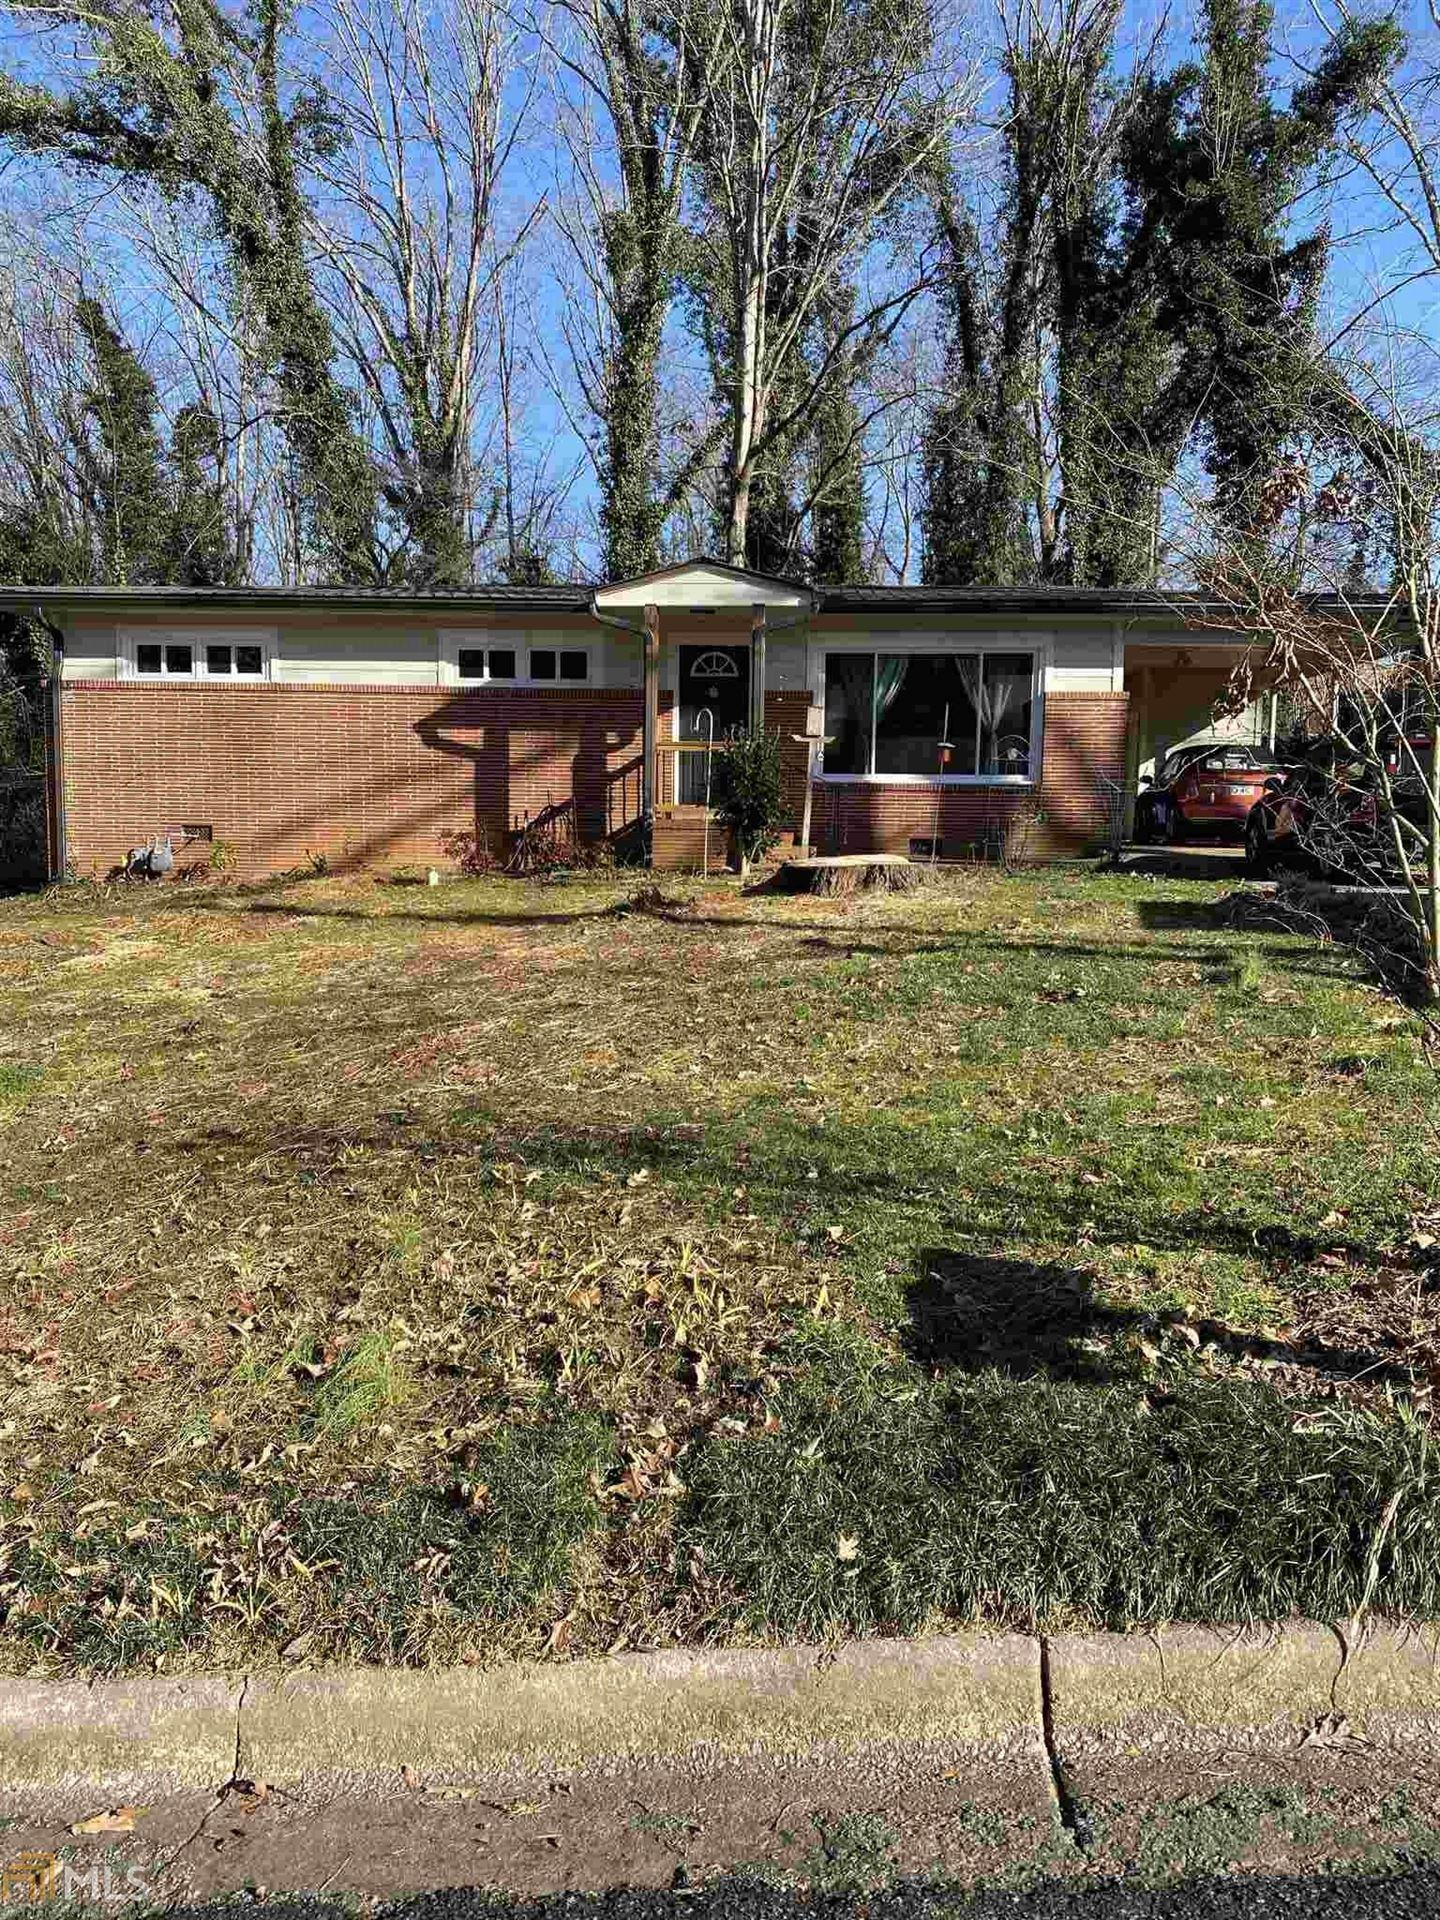 1350 Dunn Dr, Gainesville, GA 30501 - MLS#: 8912045